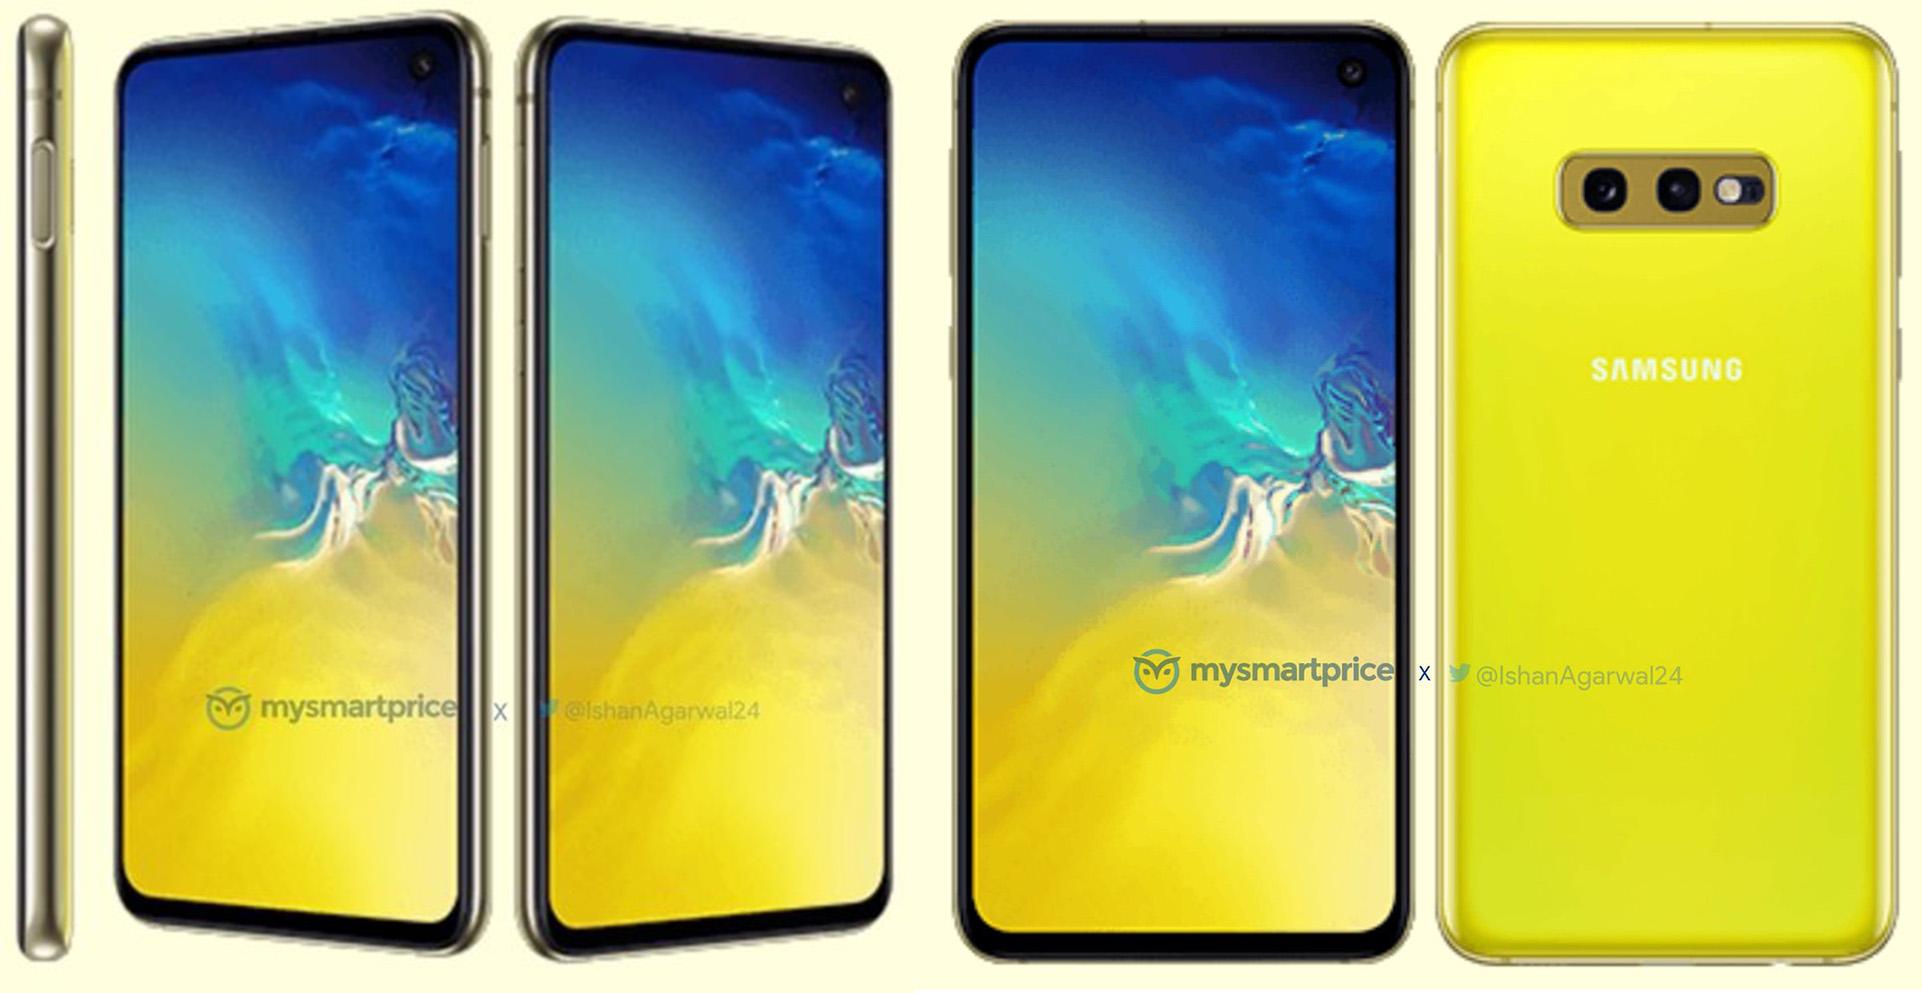 Samsung Galaxy S10e press render